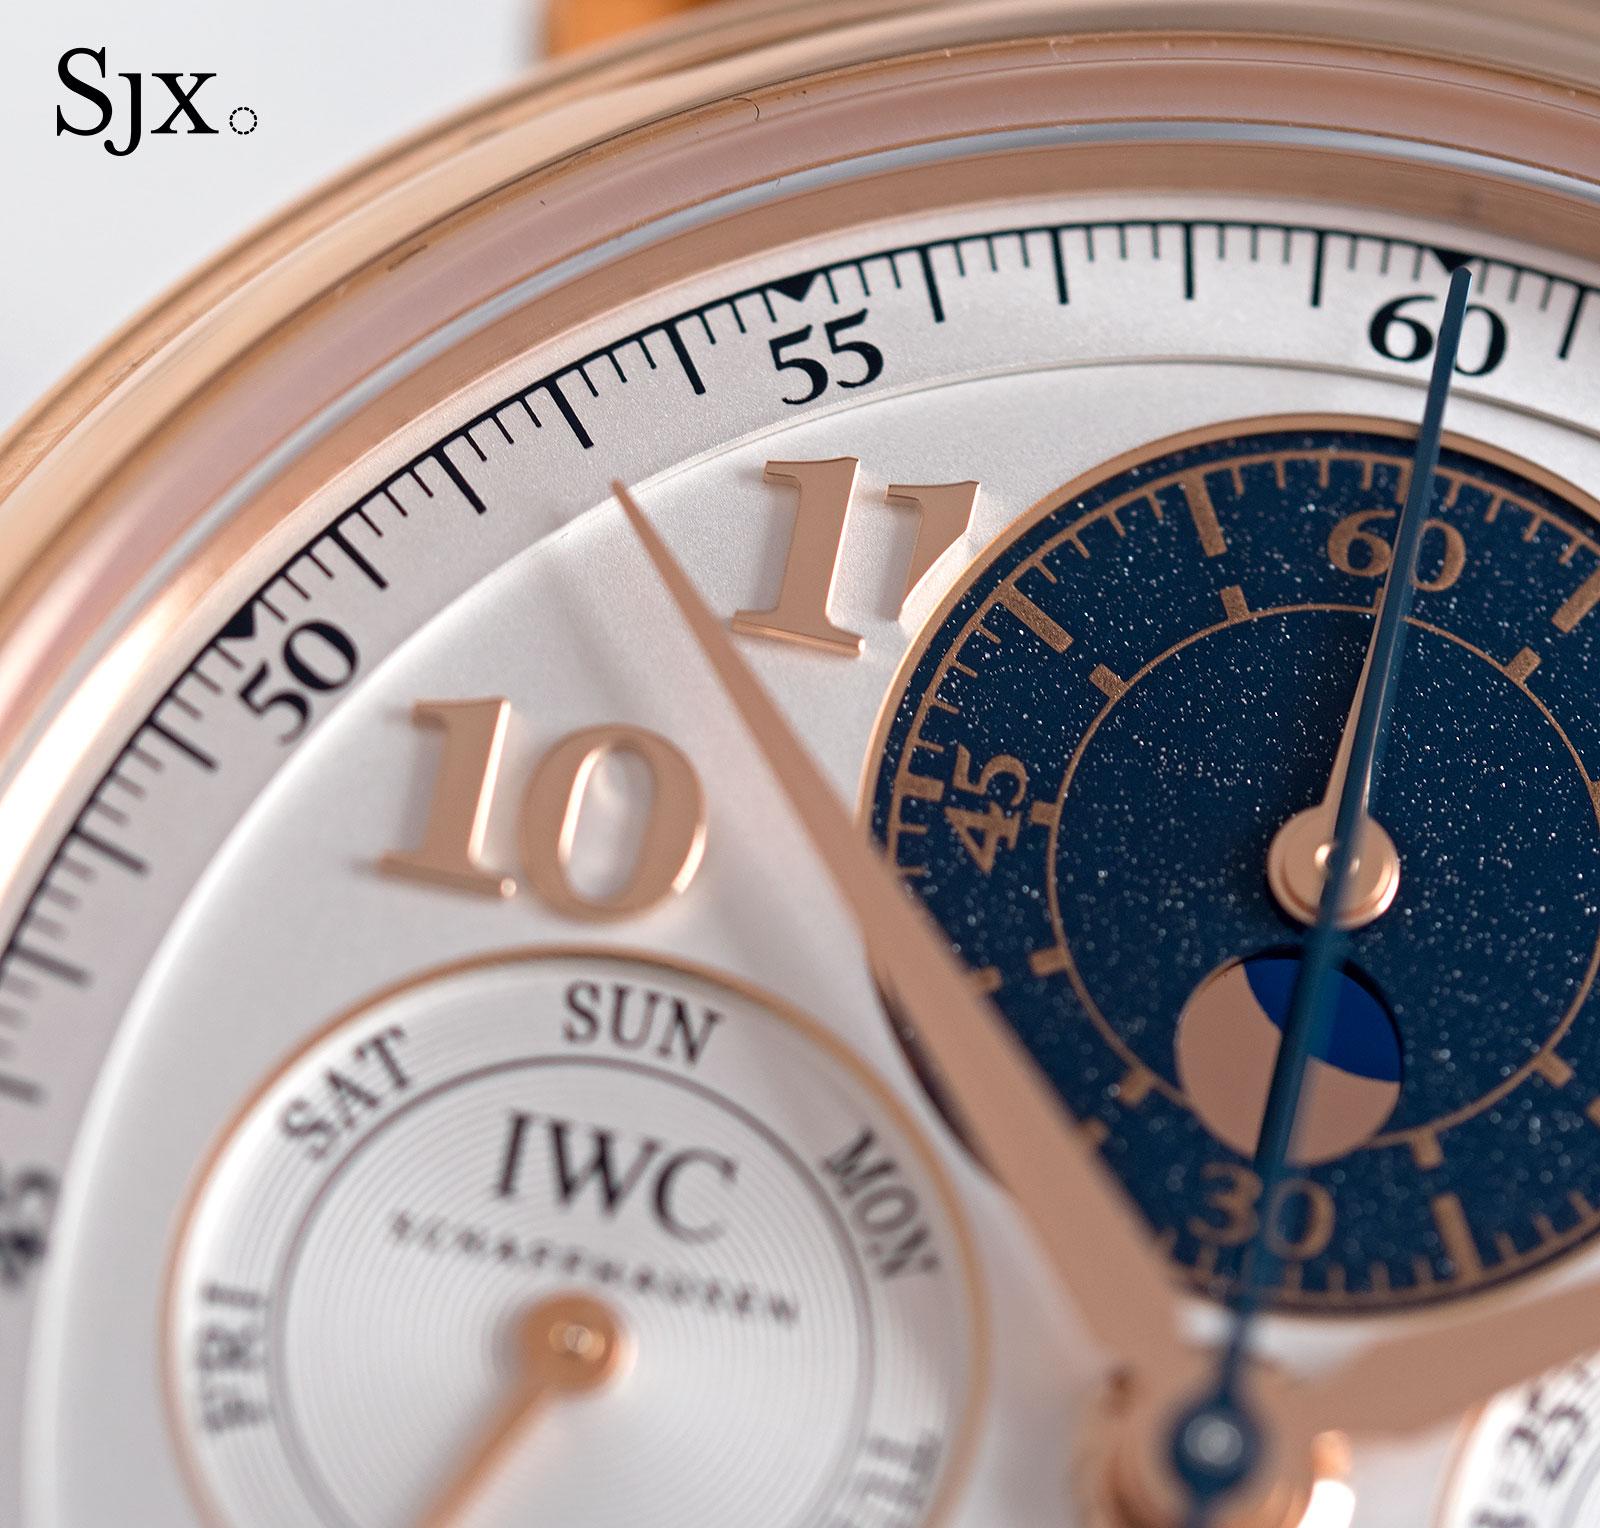 IWC Da Vinci Perpetual Calendar Chronograph red gold 2